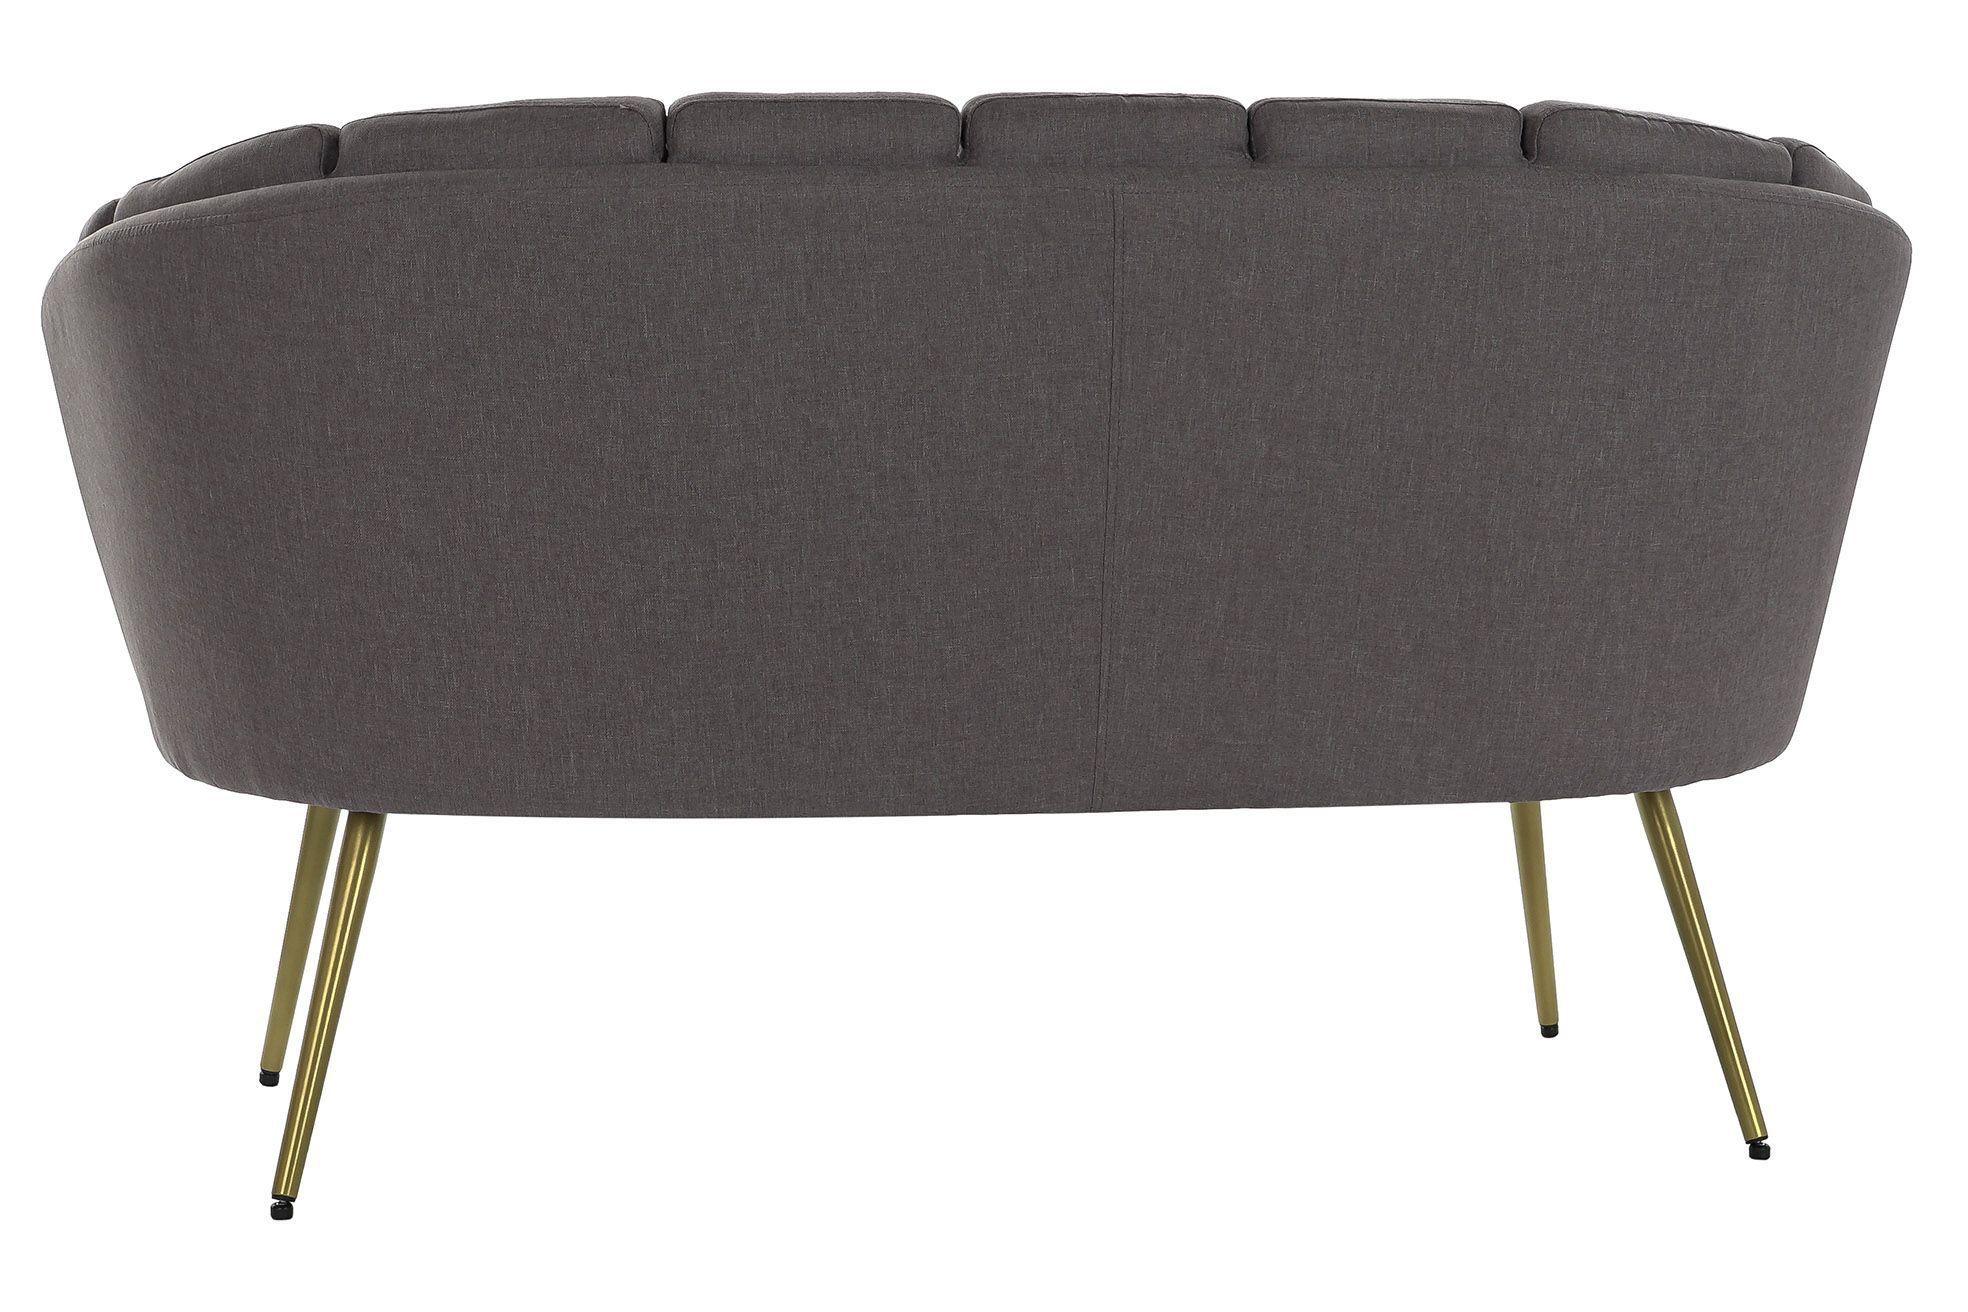 31810-sofa-scandi-deco-2p-2.jpg